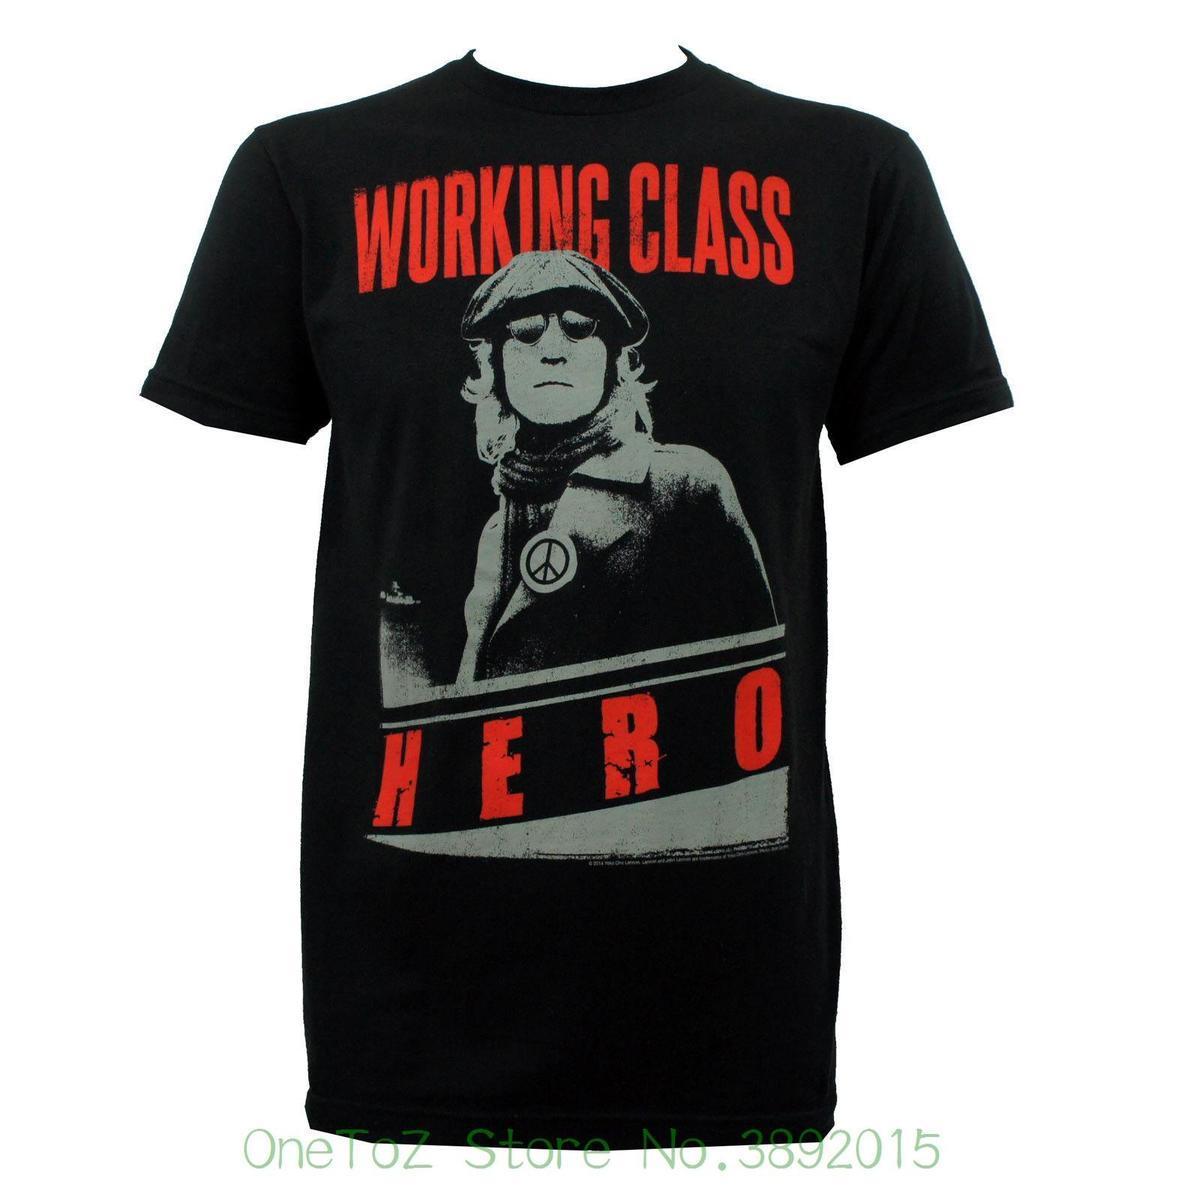 23bc873a729024 Tops Men Tee Shirts Authentic John Lennon Working Class Hero Slim T Shirt  Black S 2xl New One T Shirt A Day One Day T Shirt From Lijian038, $11.79|  DHgate.